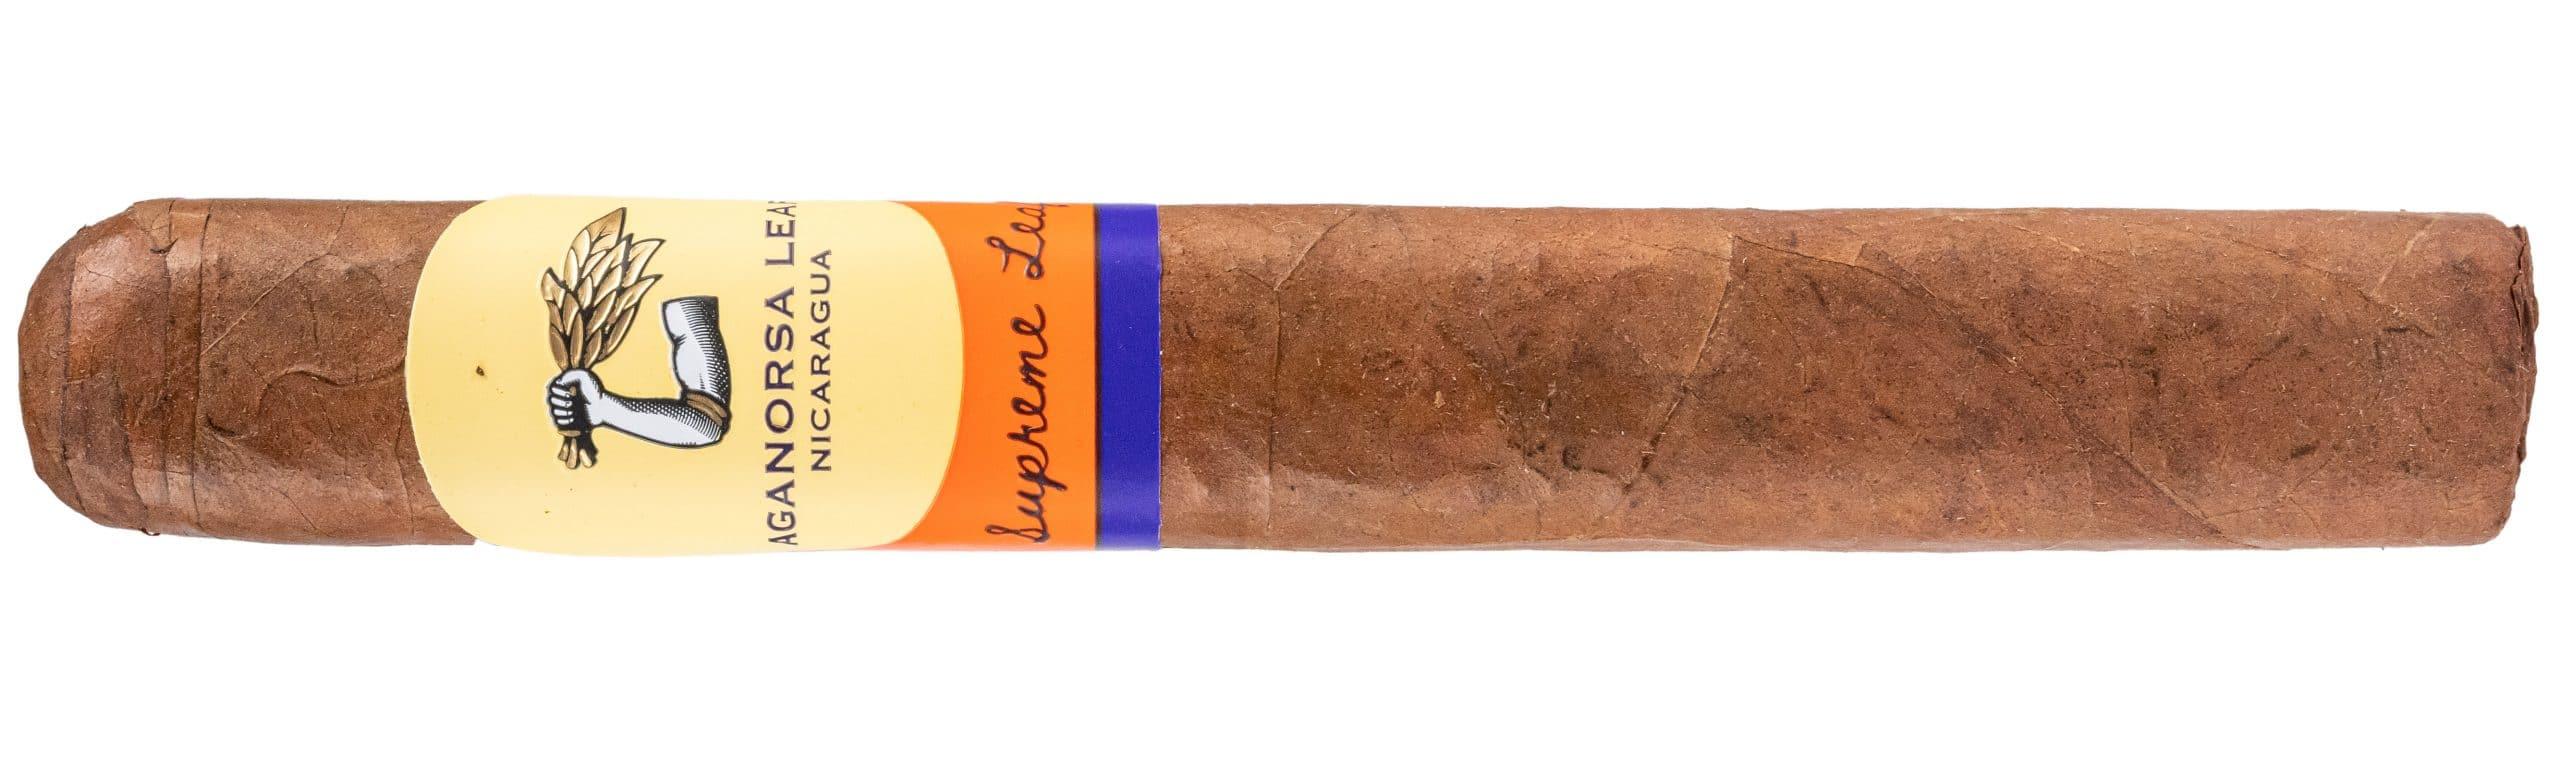 Blind Cigar Review: Aganorsa Leaf | Supreme Leaf Toro